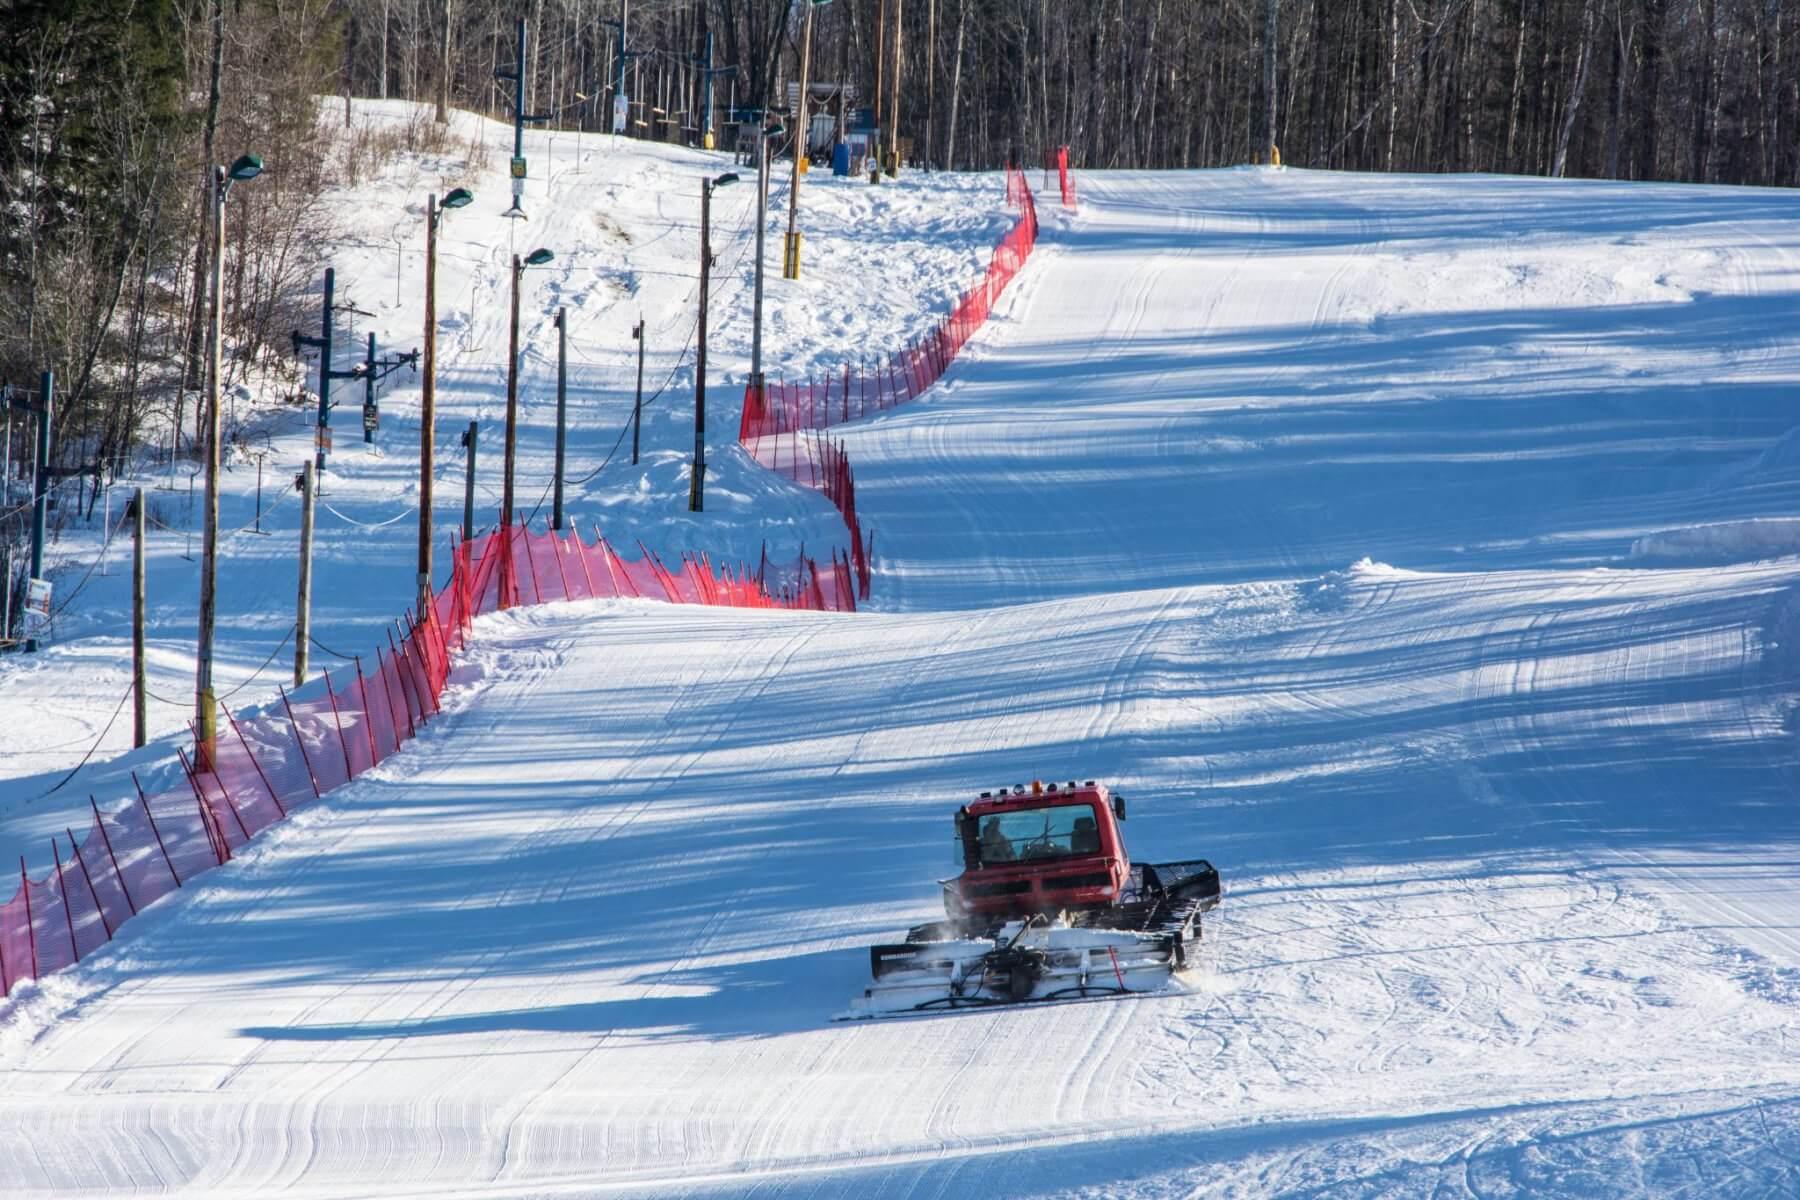 Tickets & Passes - Cochrans Ski Area